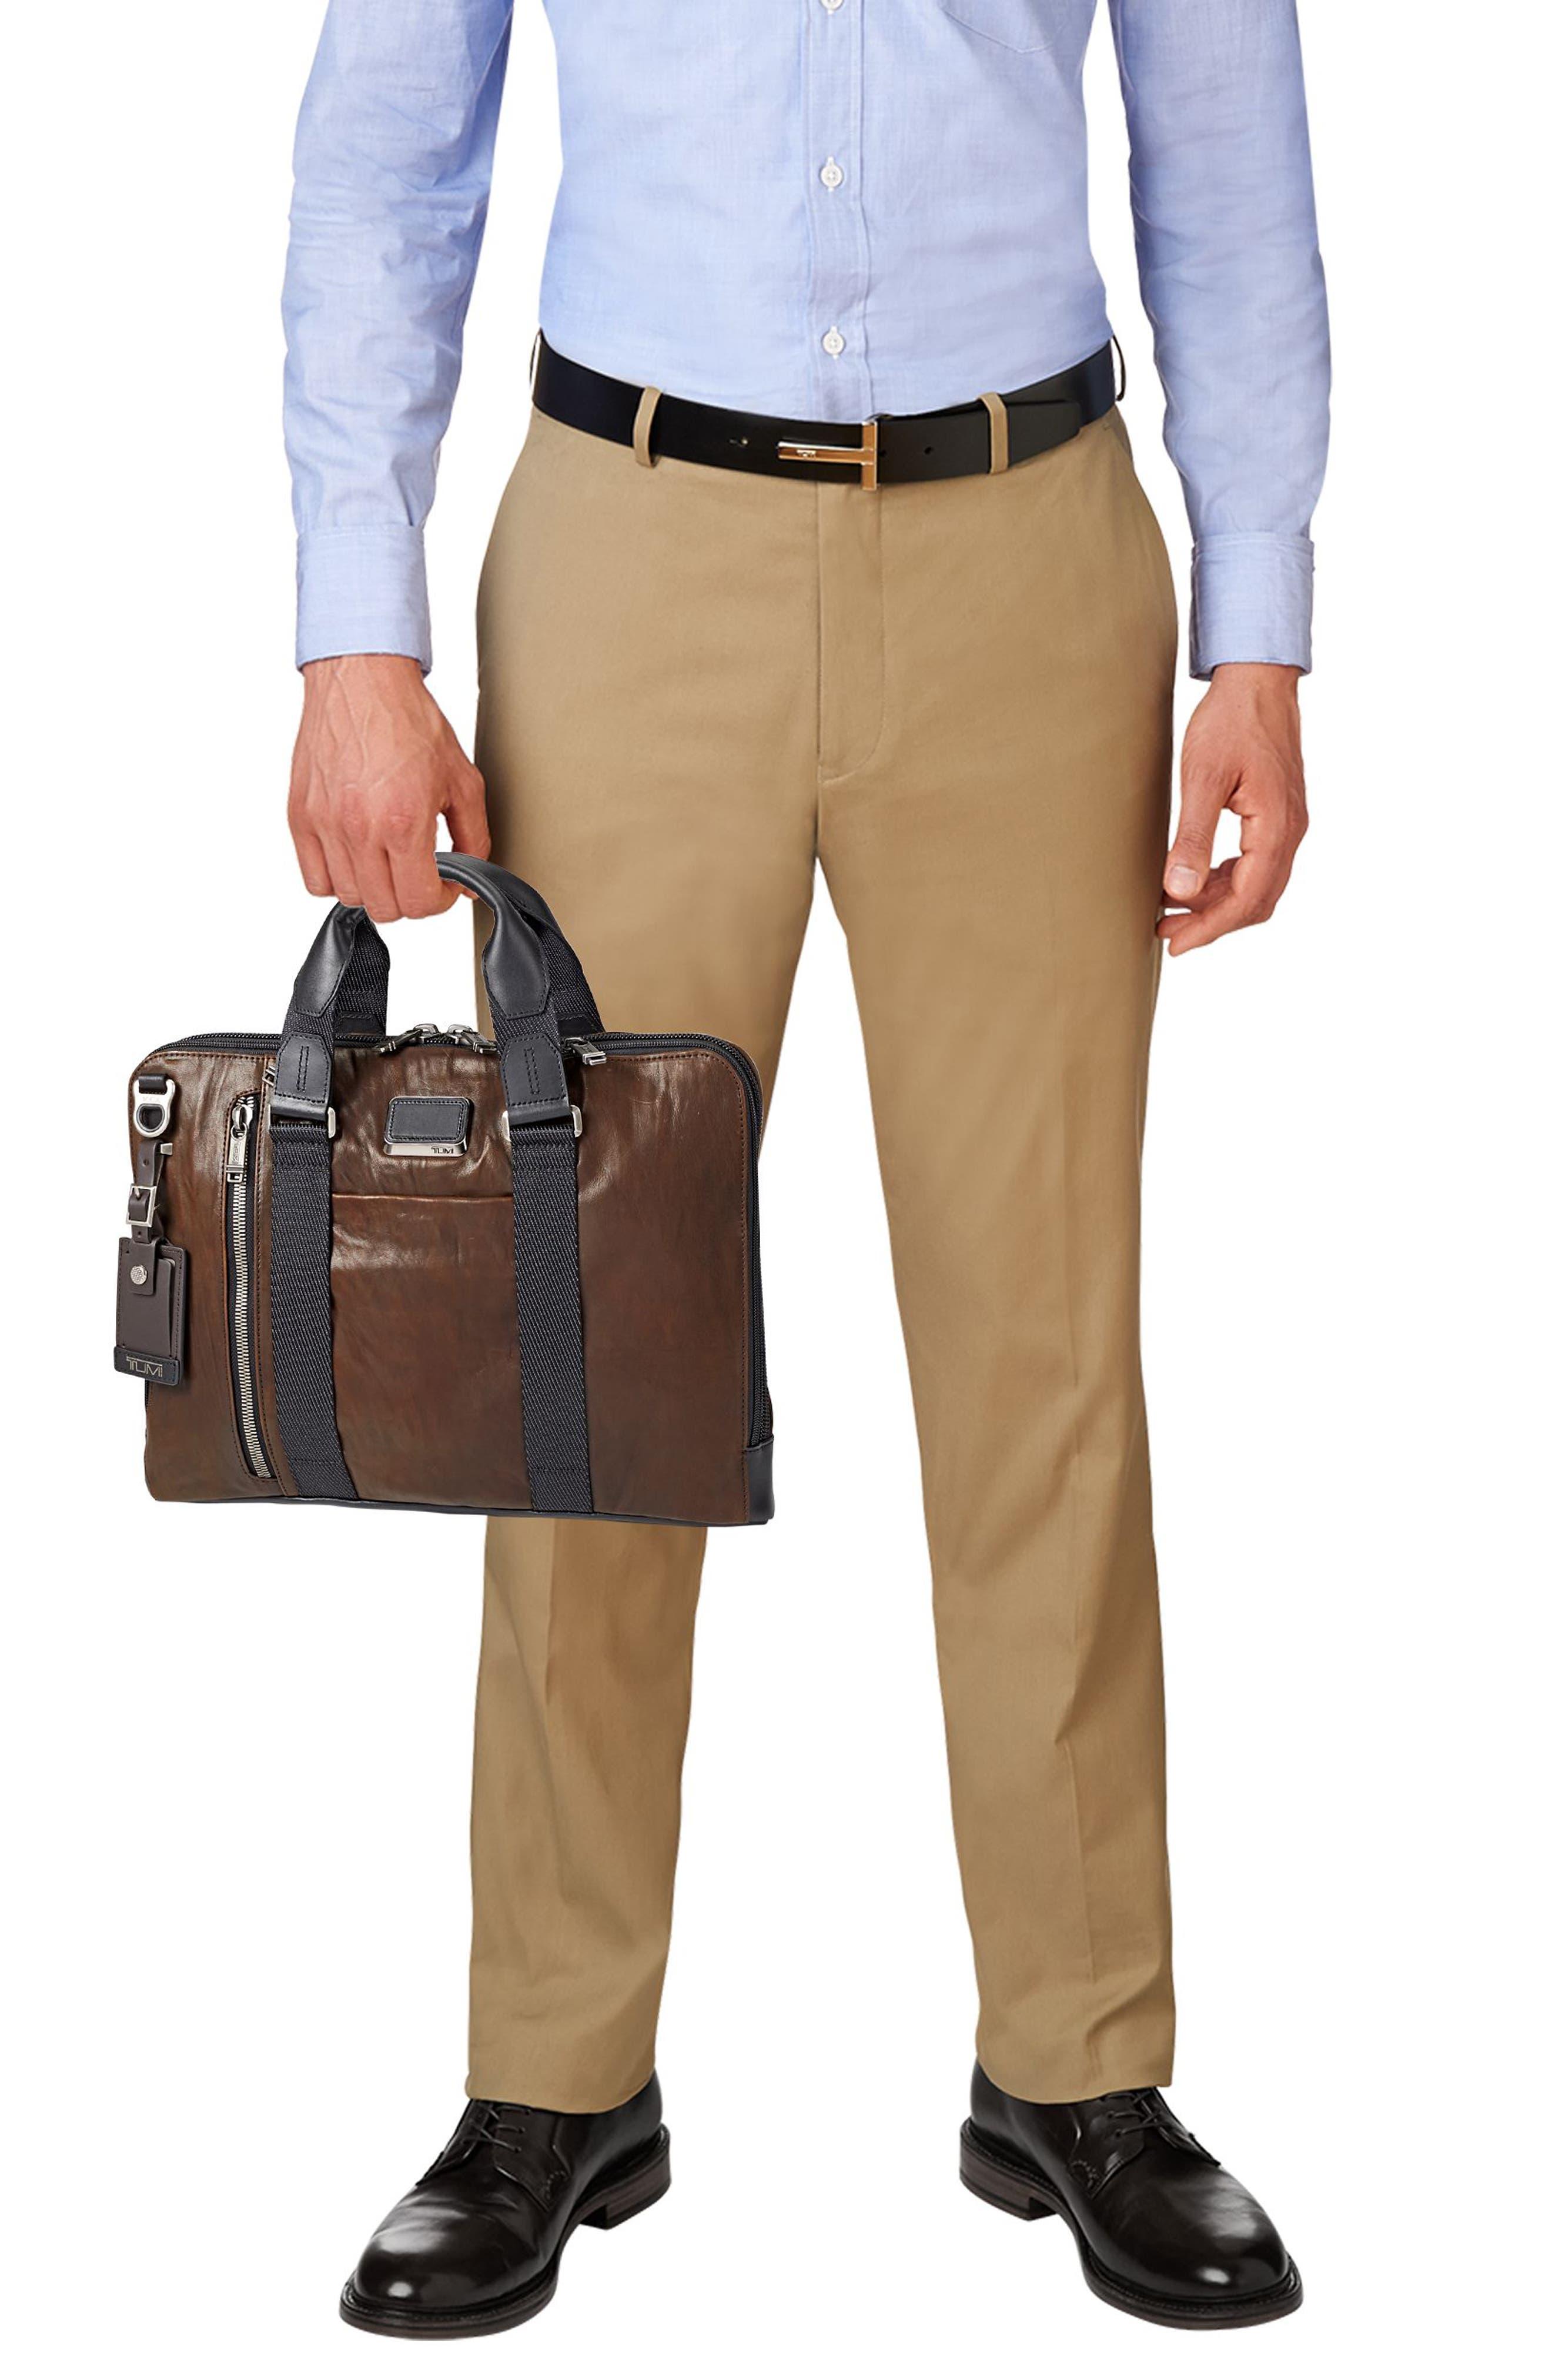 Alpha Bravo - Aviano Leather Briefcase,                             Alternate thumbnail 6, color,